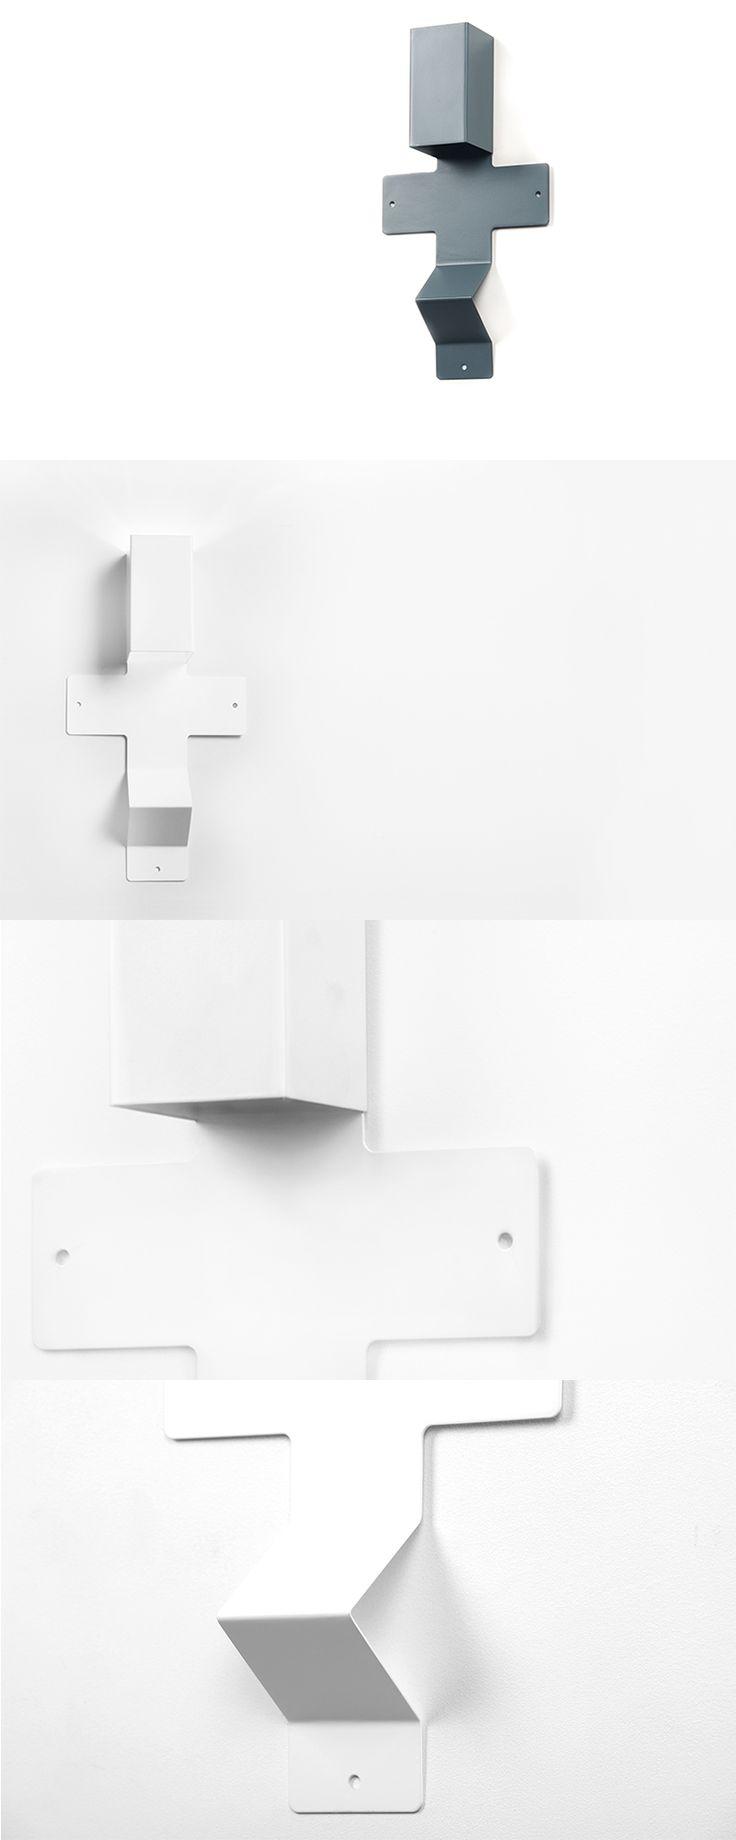 Offiseria LuceInCroce, Product Design ─ Giulio Patrizi Design Agency ©   #product #design